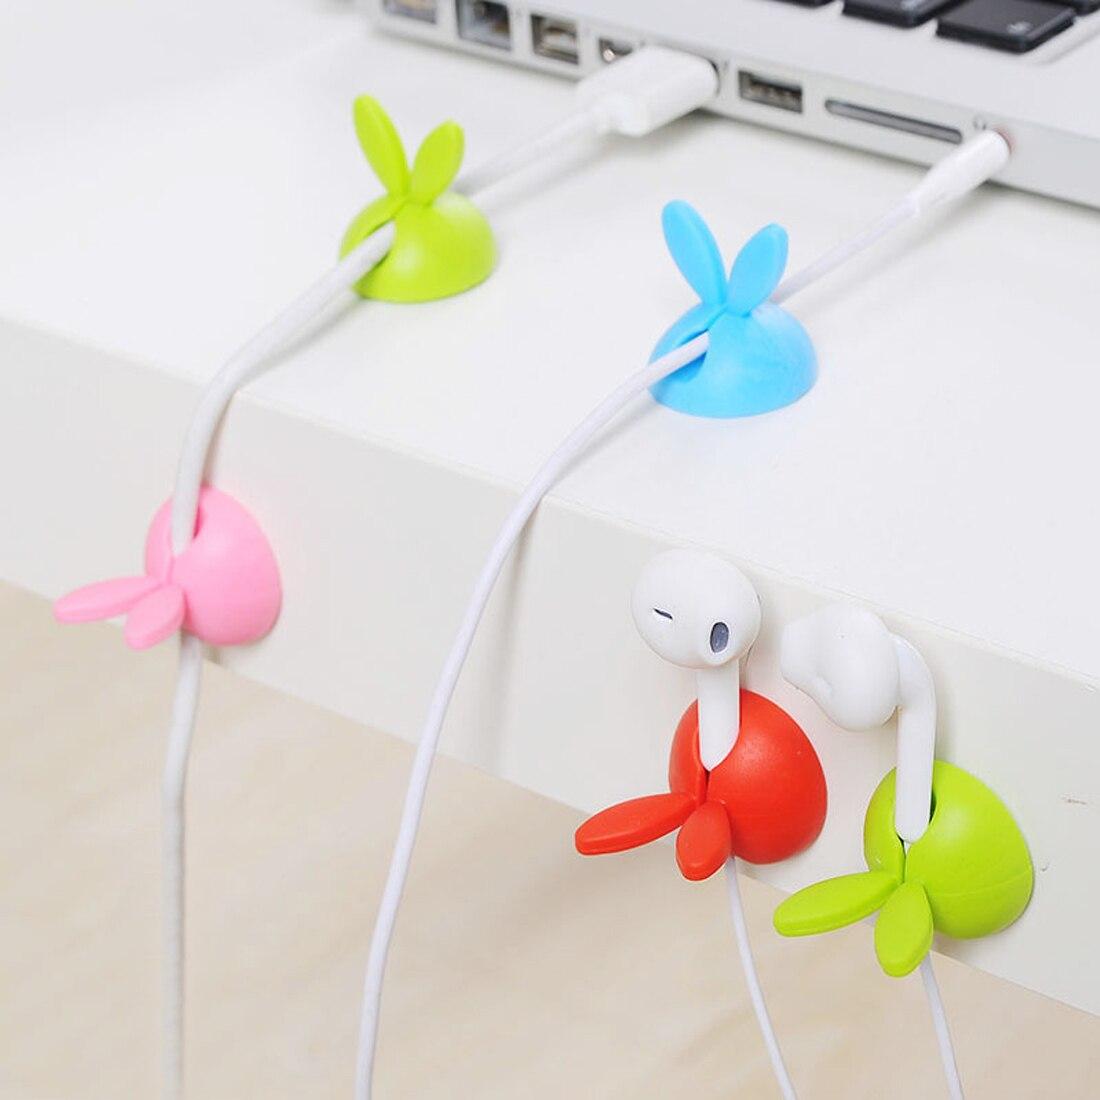 Holder Cable-Organizer Headphone Computer Rabbit-Ear Desktop-Winder 4pcs For Home Office